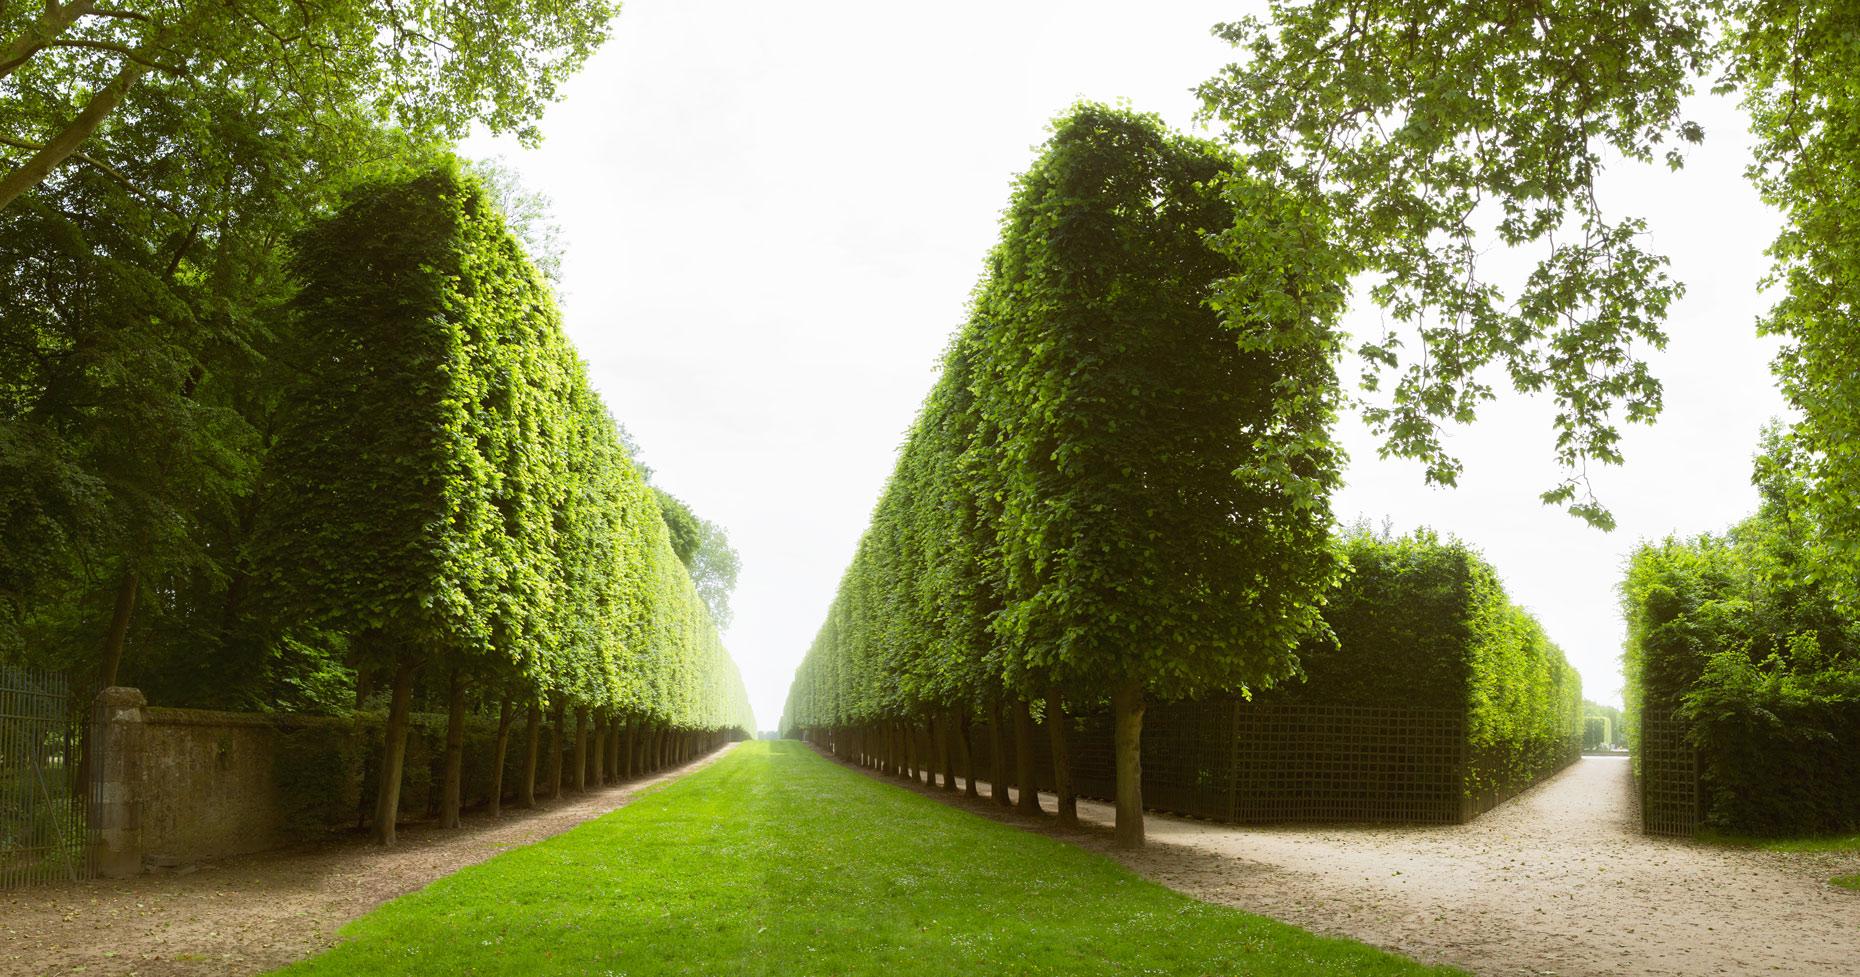 Travel Photography Derek Israelsen 054 Versailles Row of Trees